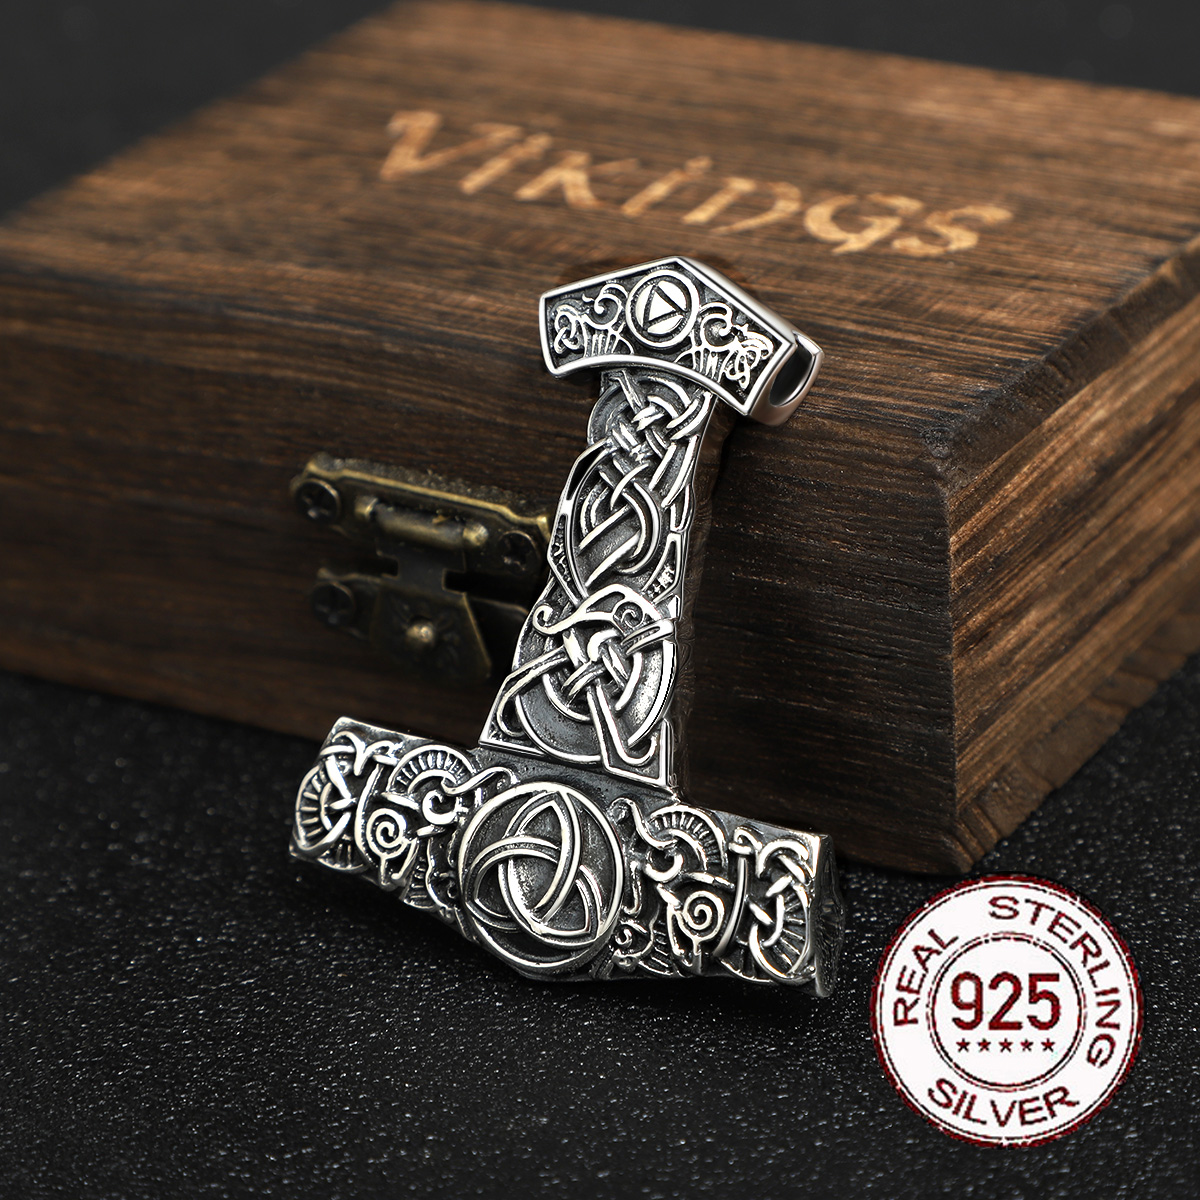 S925 노르웨이 바이킹 펜던트 목걸이 토르의 망치 mjolnir 스칸디나비아 오딘 부적 남자 보석 체인 선물